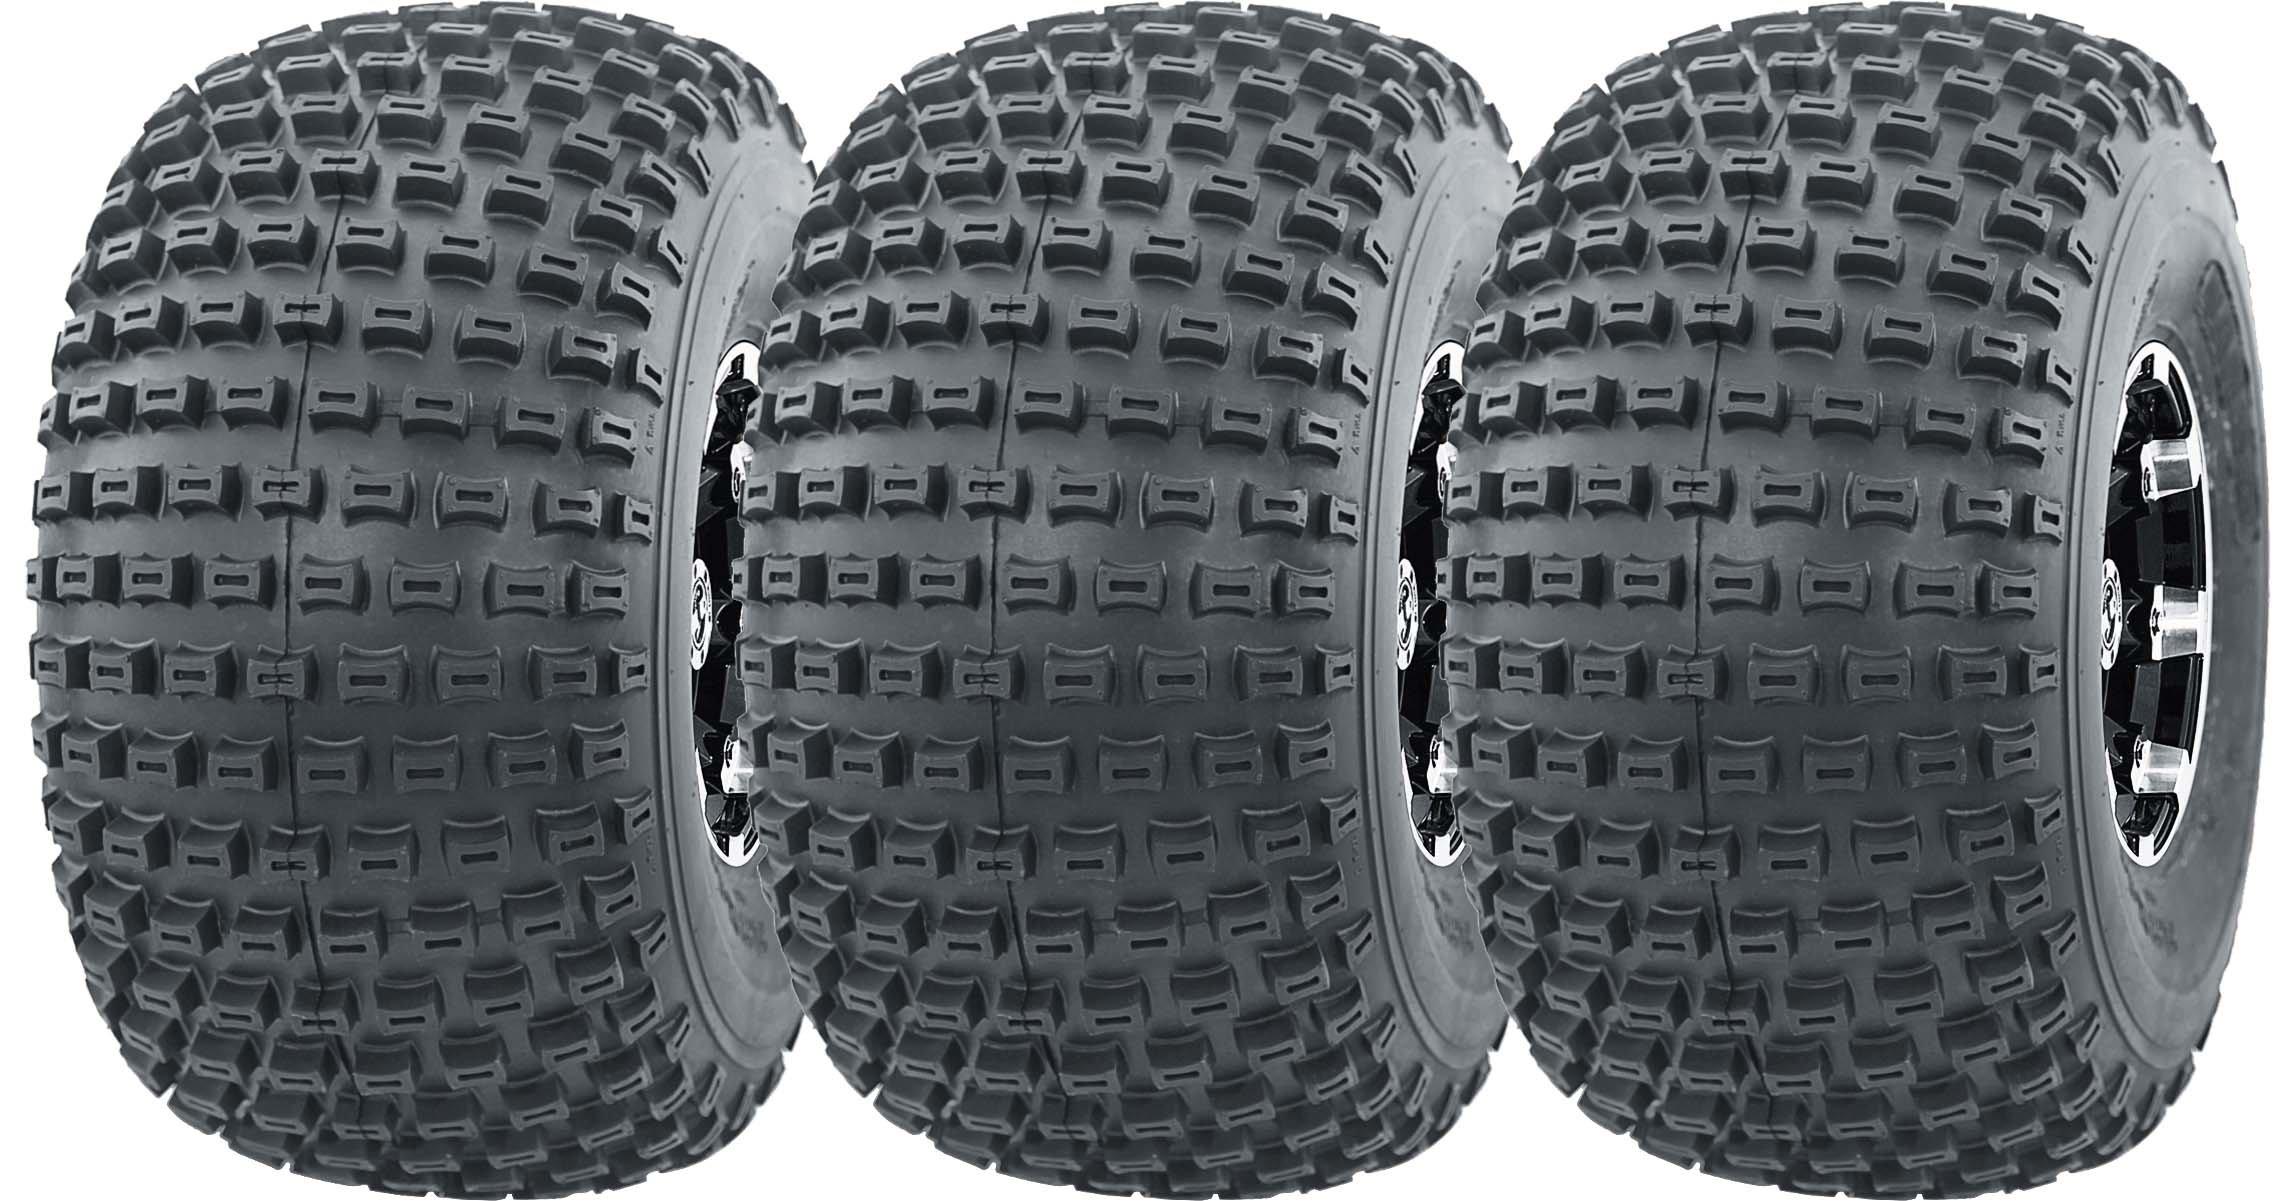 3 New 3 Wheeler WANDA ATV Tires 22X11-8 4PR P322 Dimple Knobby - 10026